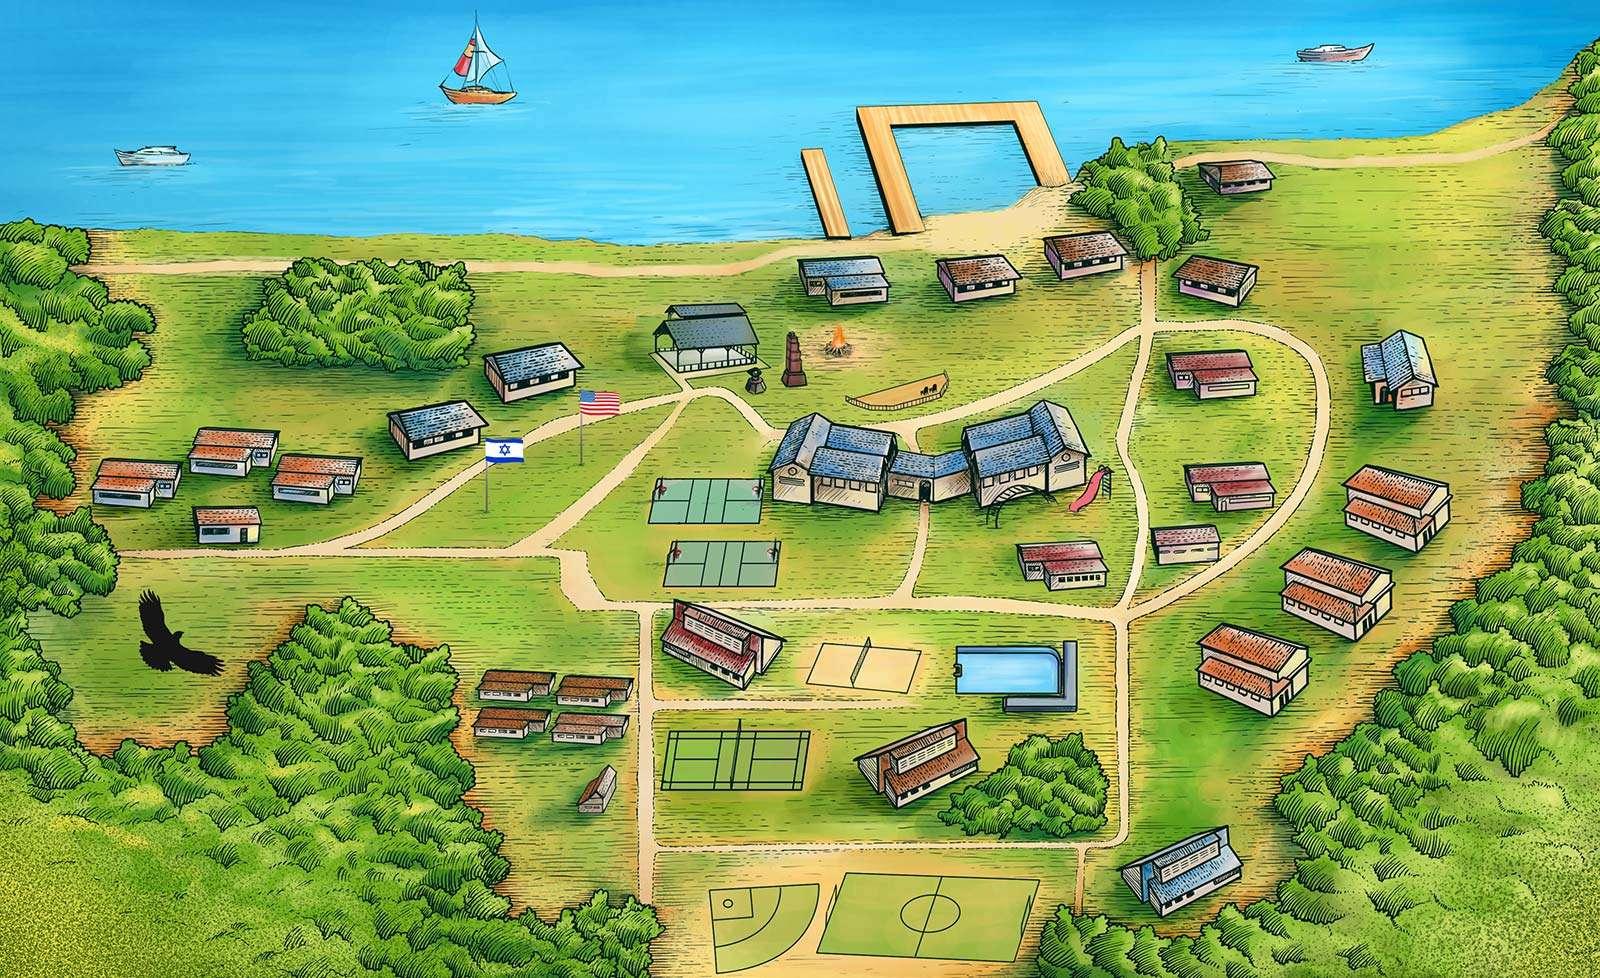 Interactive Camp Zeke map